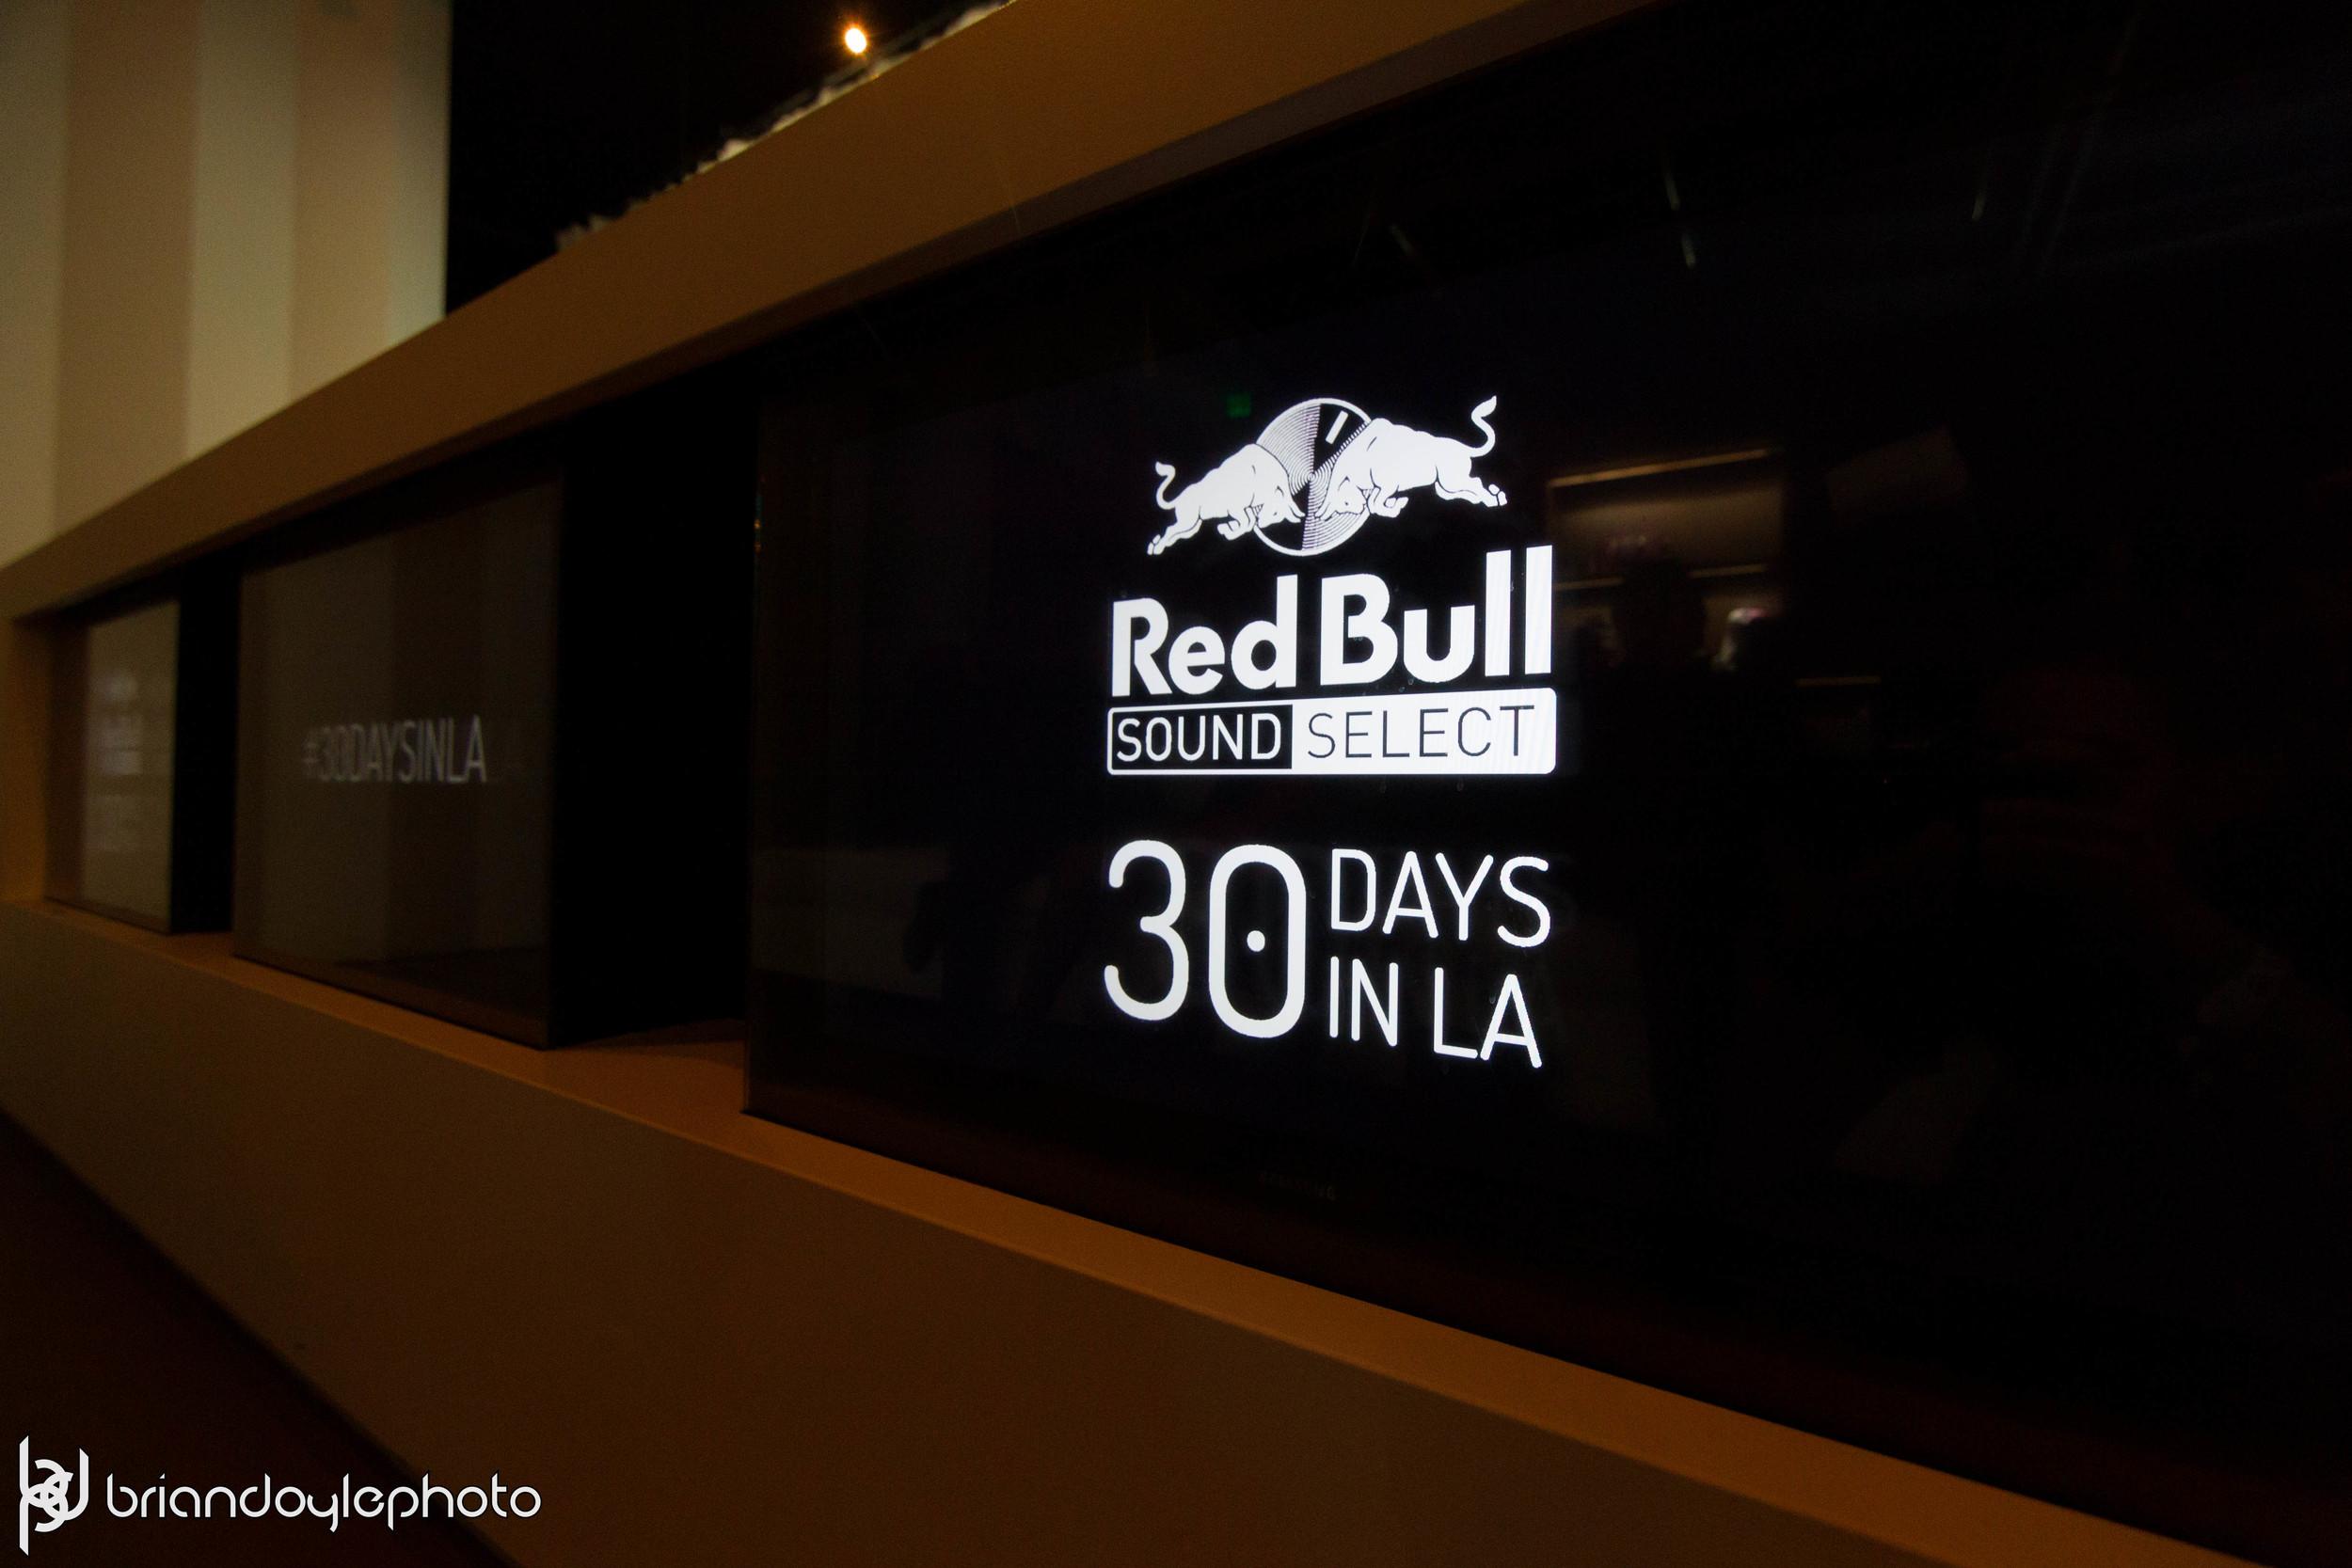 Red Bull - Dum Dum Girls, Tropicana and the Flea, Lowell @ The Well 2014.11.16-36.jpg